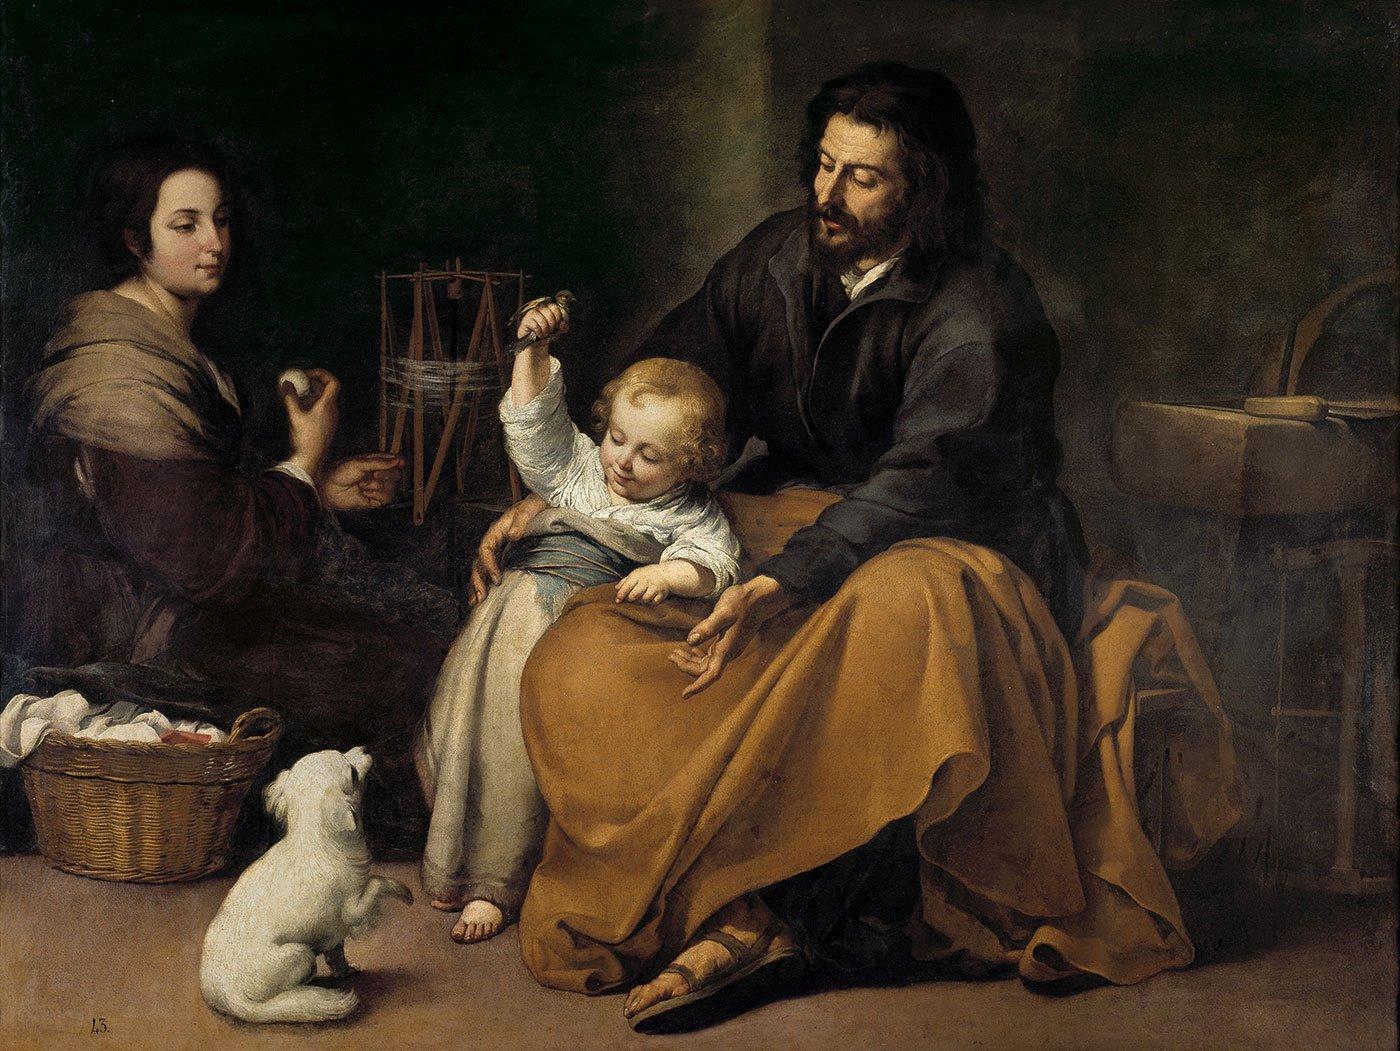 la-sagrada-familia-obra-murillo. La Sagrada Familia del pajarito. Murillo hacia 1650. Museo del Prado, Madrid.